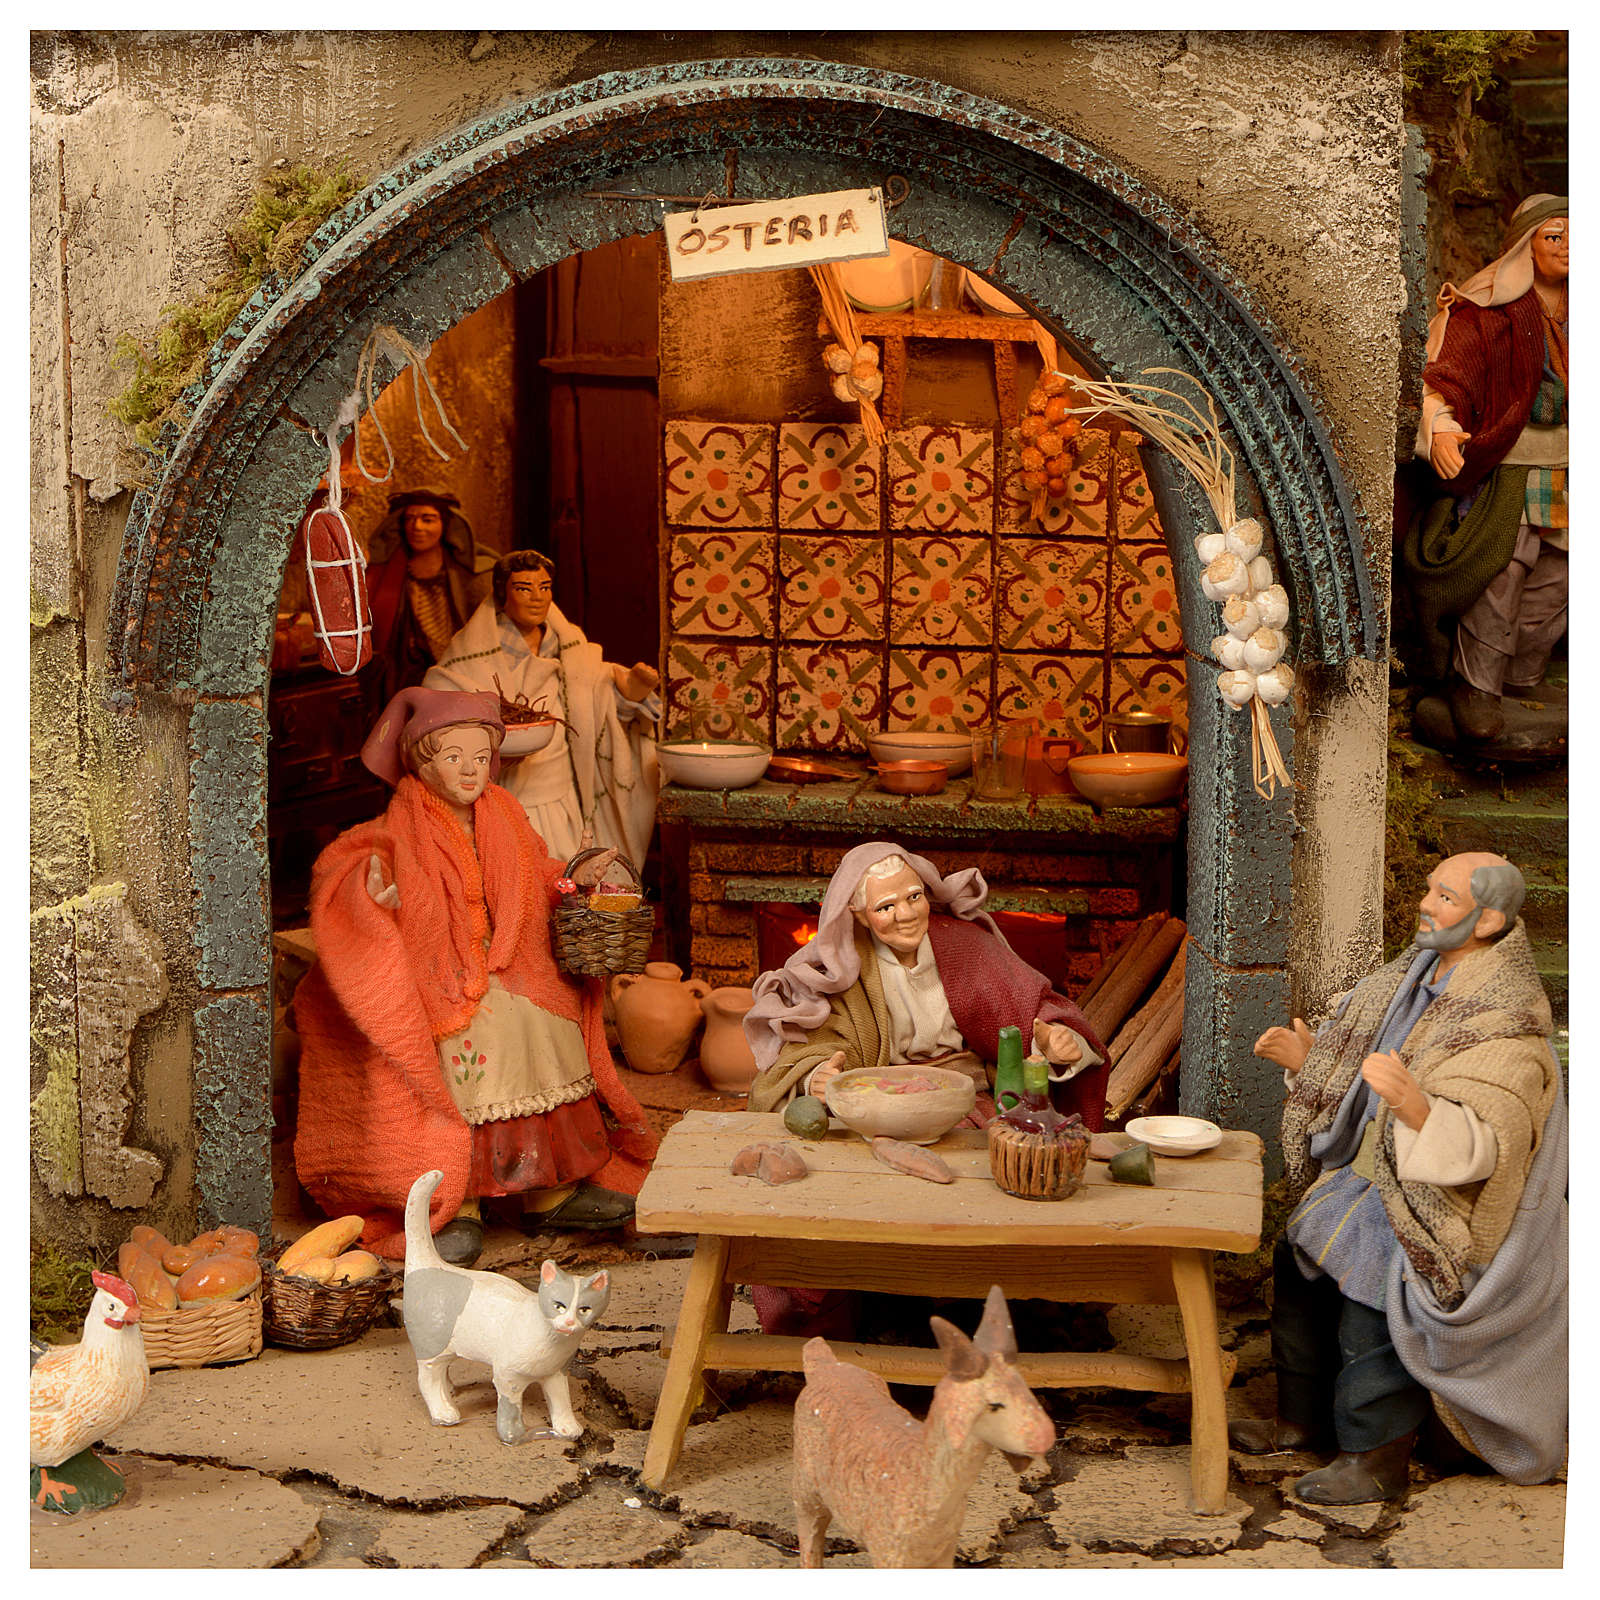 Village setting for Neapolitan Nativity scene 120x400x100 cm, 4 modules, 125 shepherds, 20 movements - 14 cm 4